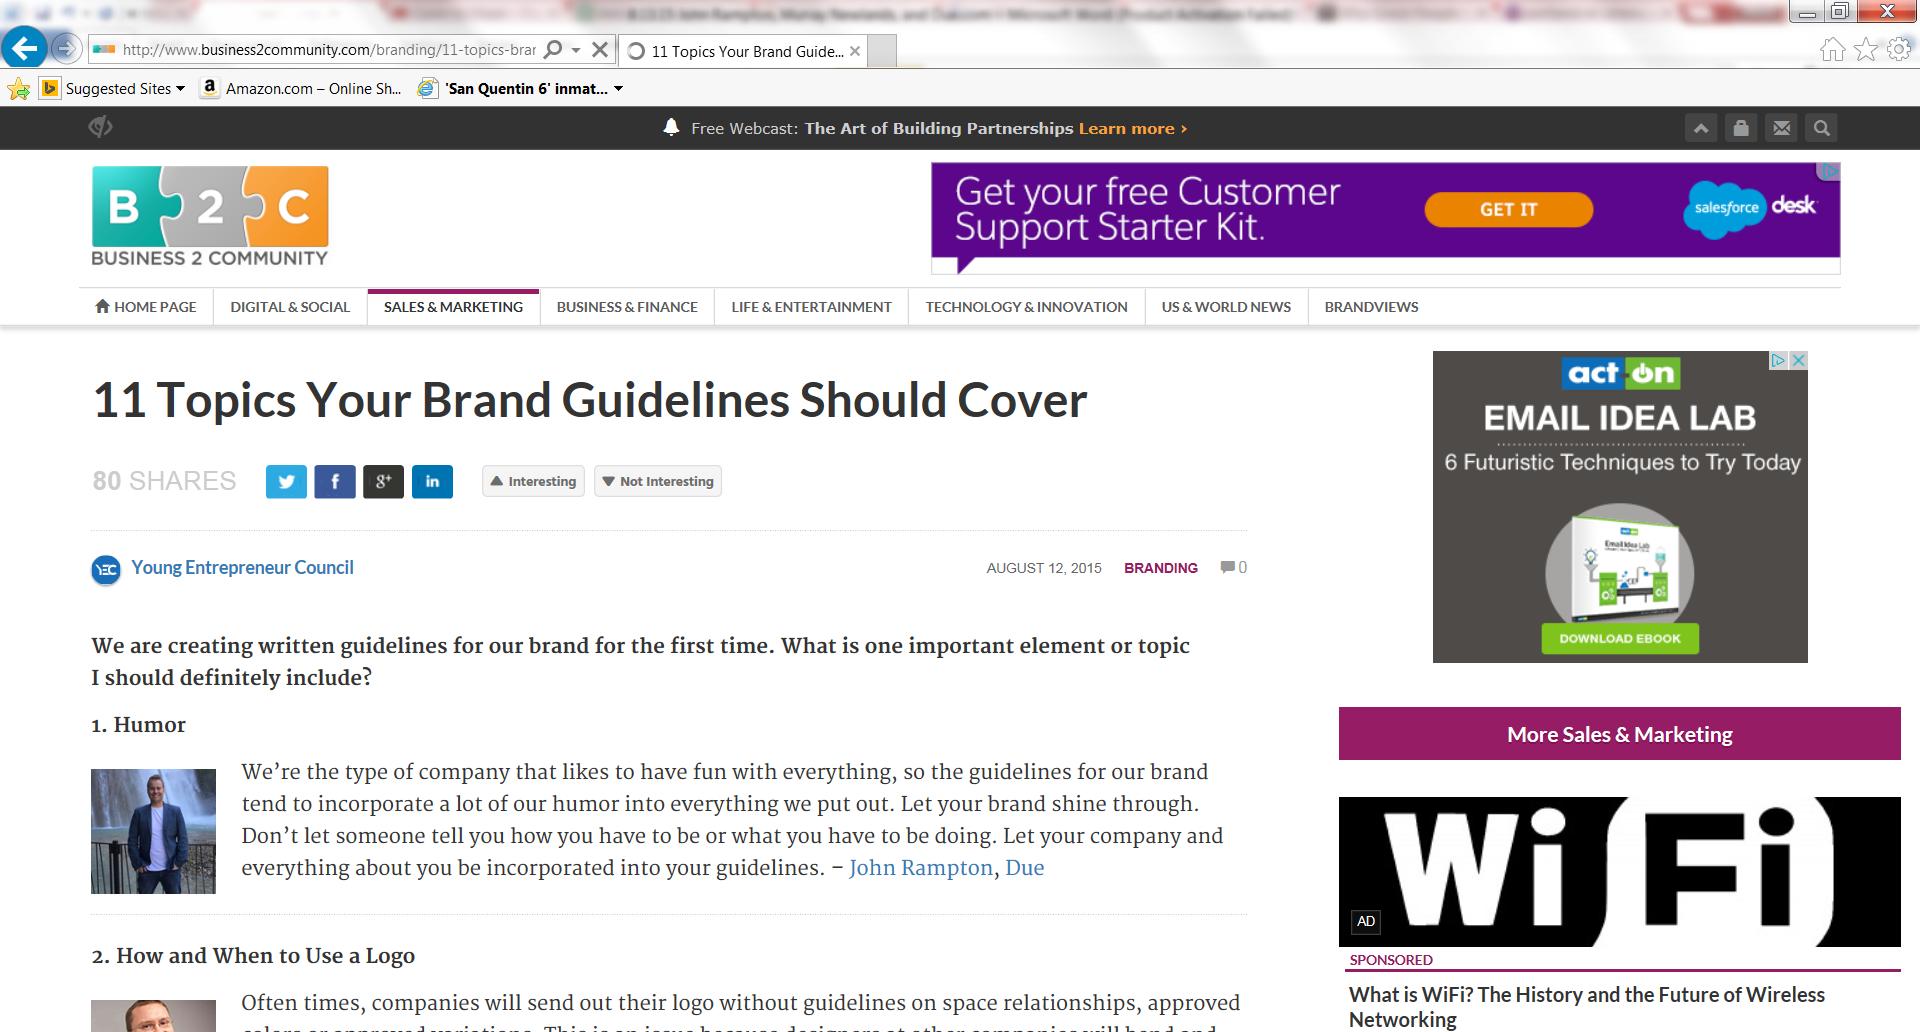 11 Topics Your Brand Guidelines Should Cover - Meet John Rampton